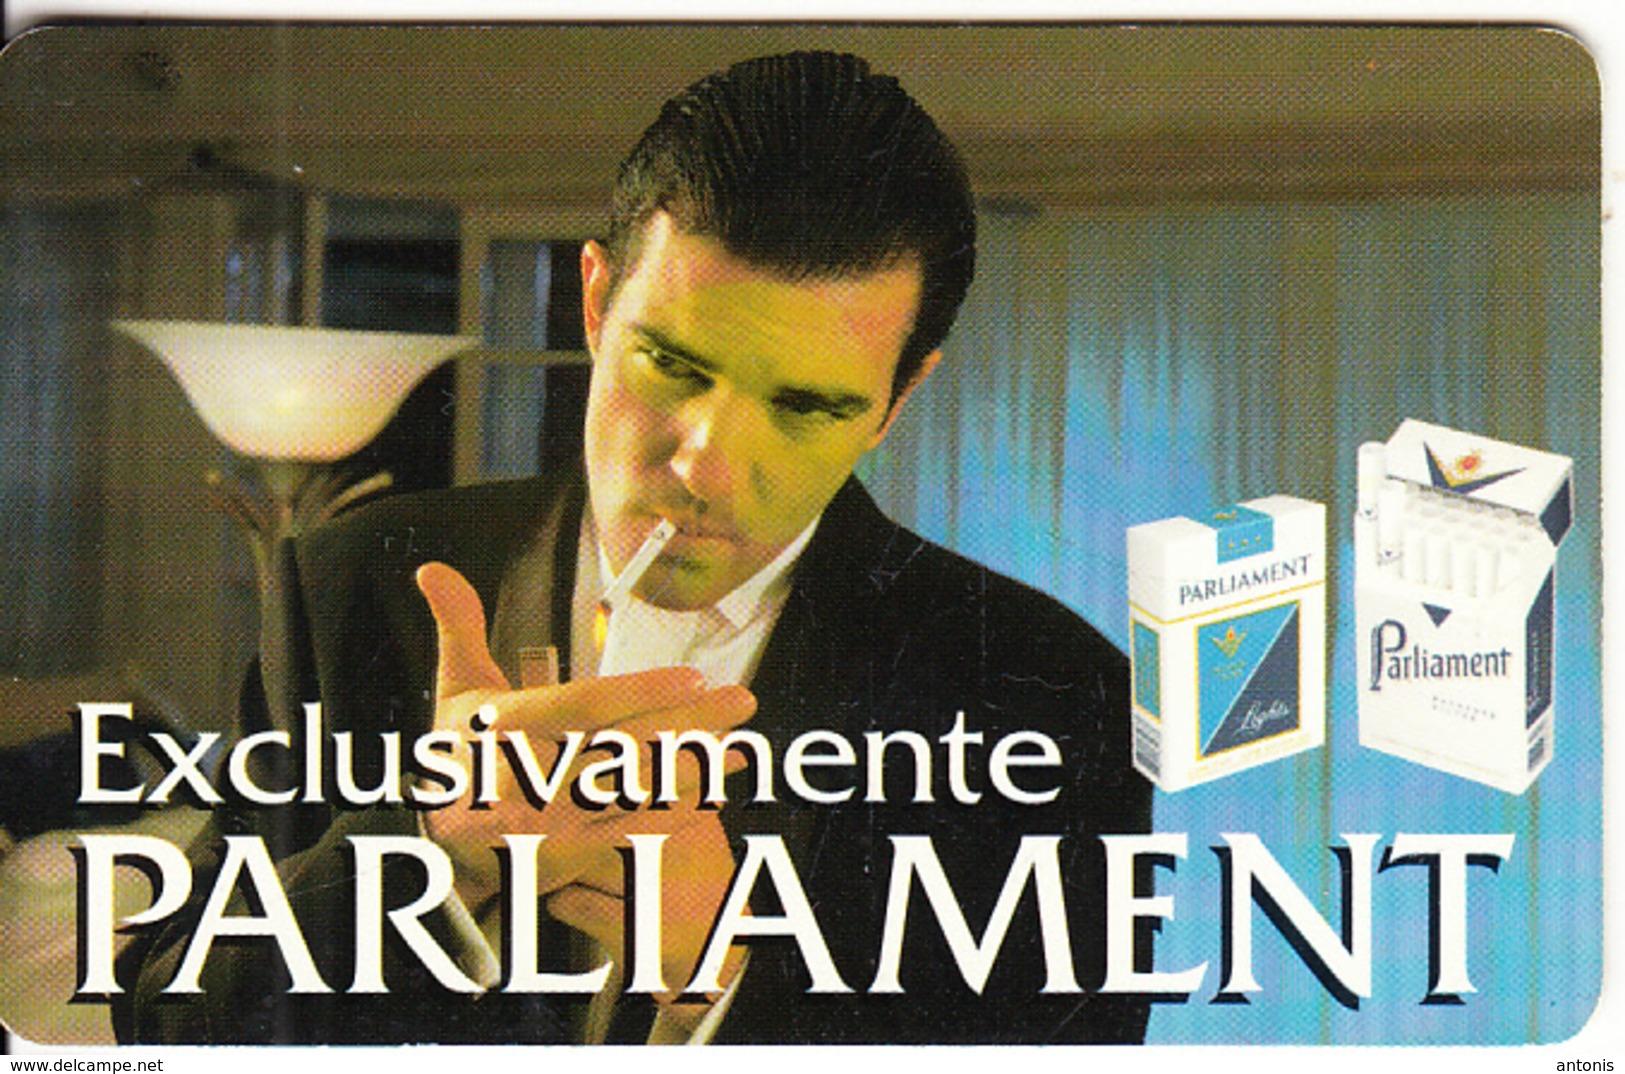 ARGENTINA(chip) - Parliament Cigarettes, Telefonica Telecard(P 8), 10/96, Used - Argentina